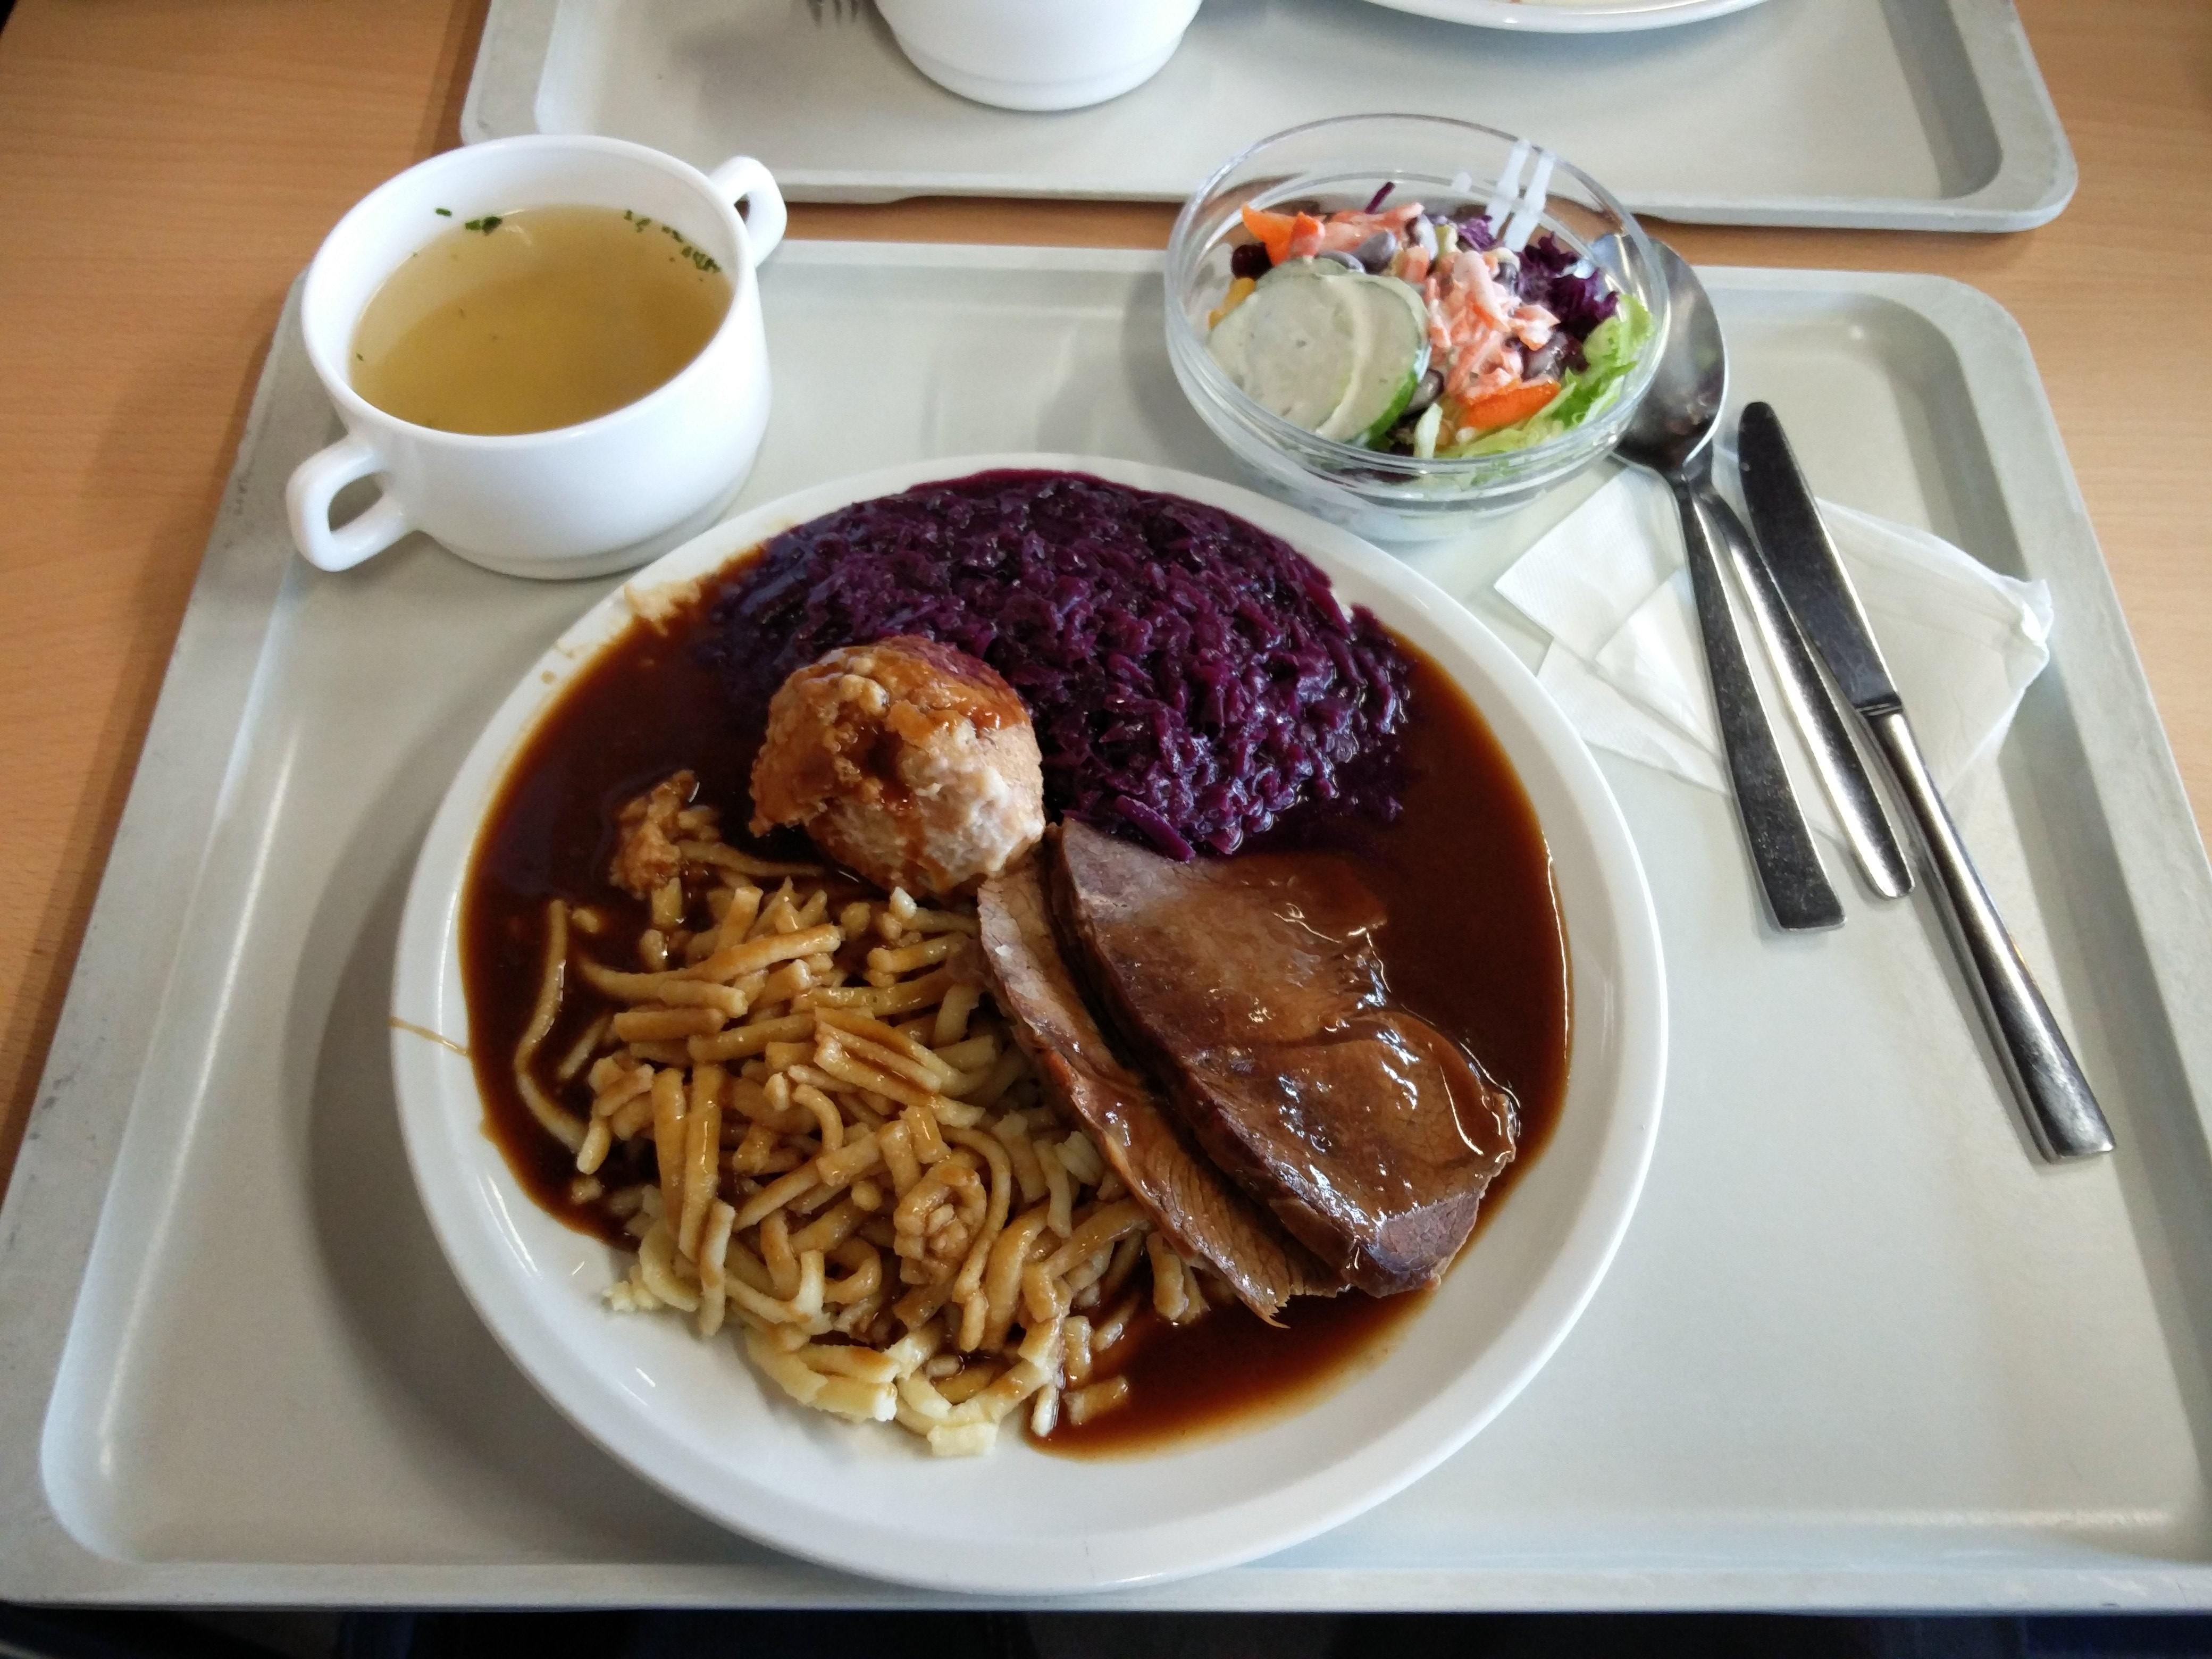 https://foodloader.net/nico_2016-11-16_sauerbraten-spaetzle-rotkraut-knoedel-suppe-salat.jpg